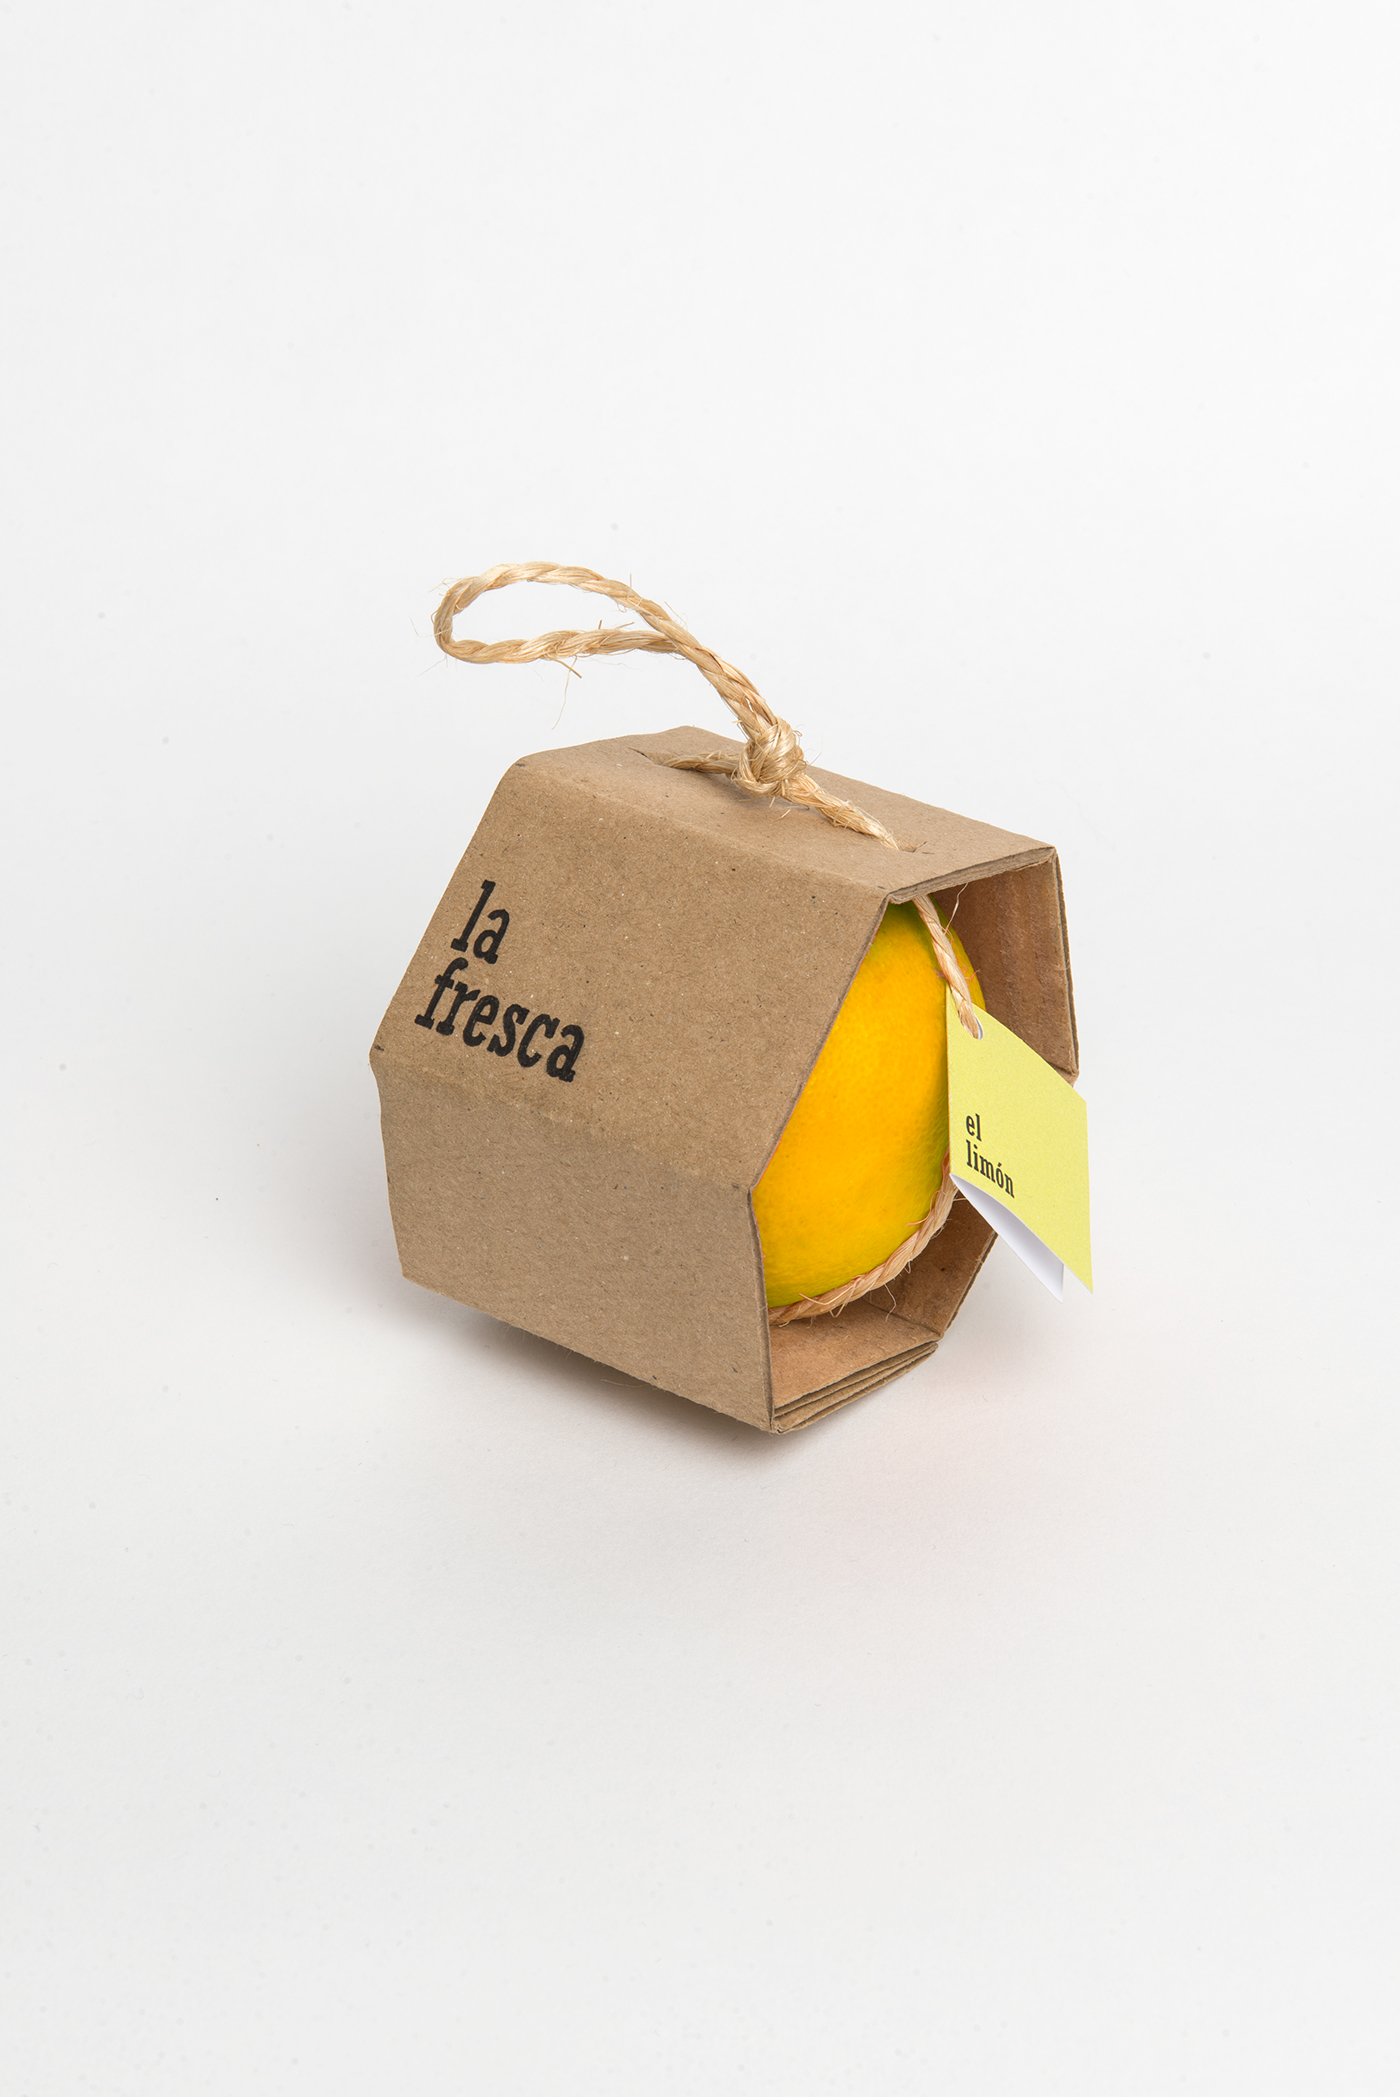 orange apple lemon yellow green hexagon hexagono amarillo naranja Verde manzana limon Pack